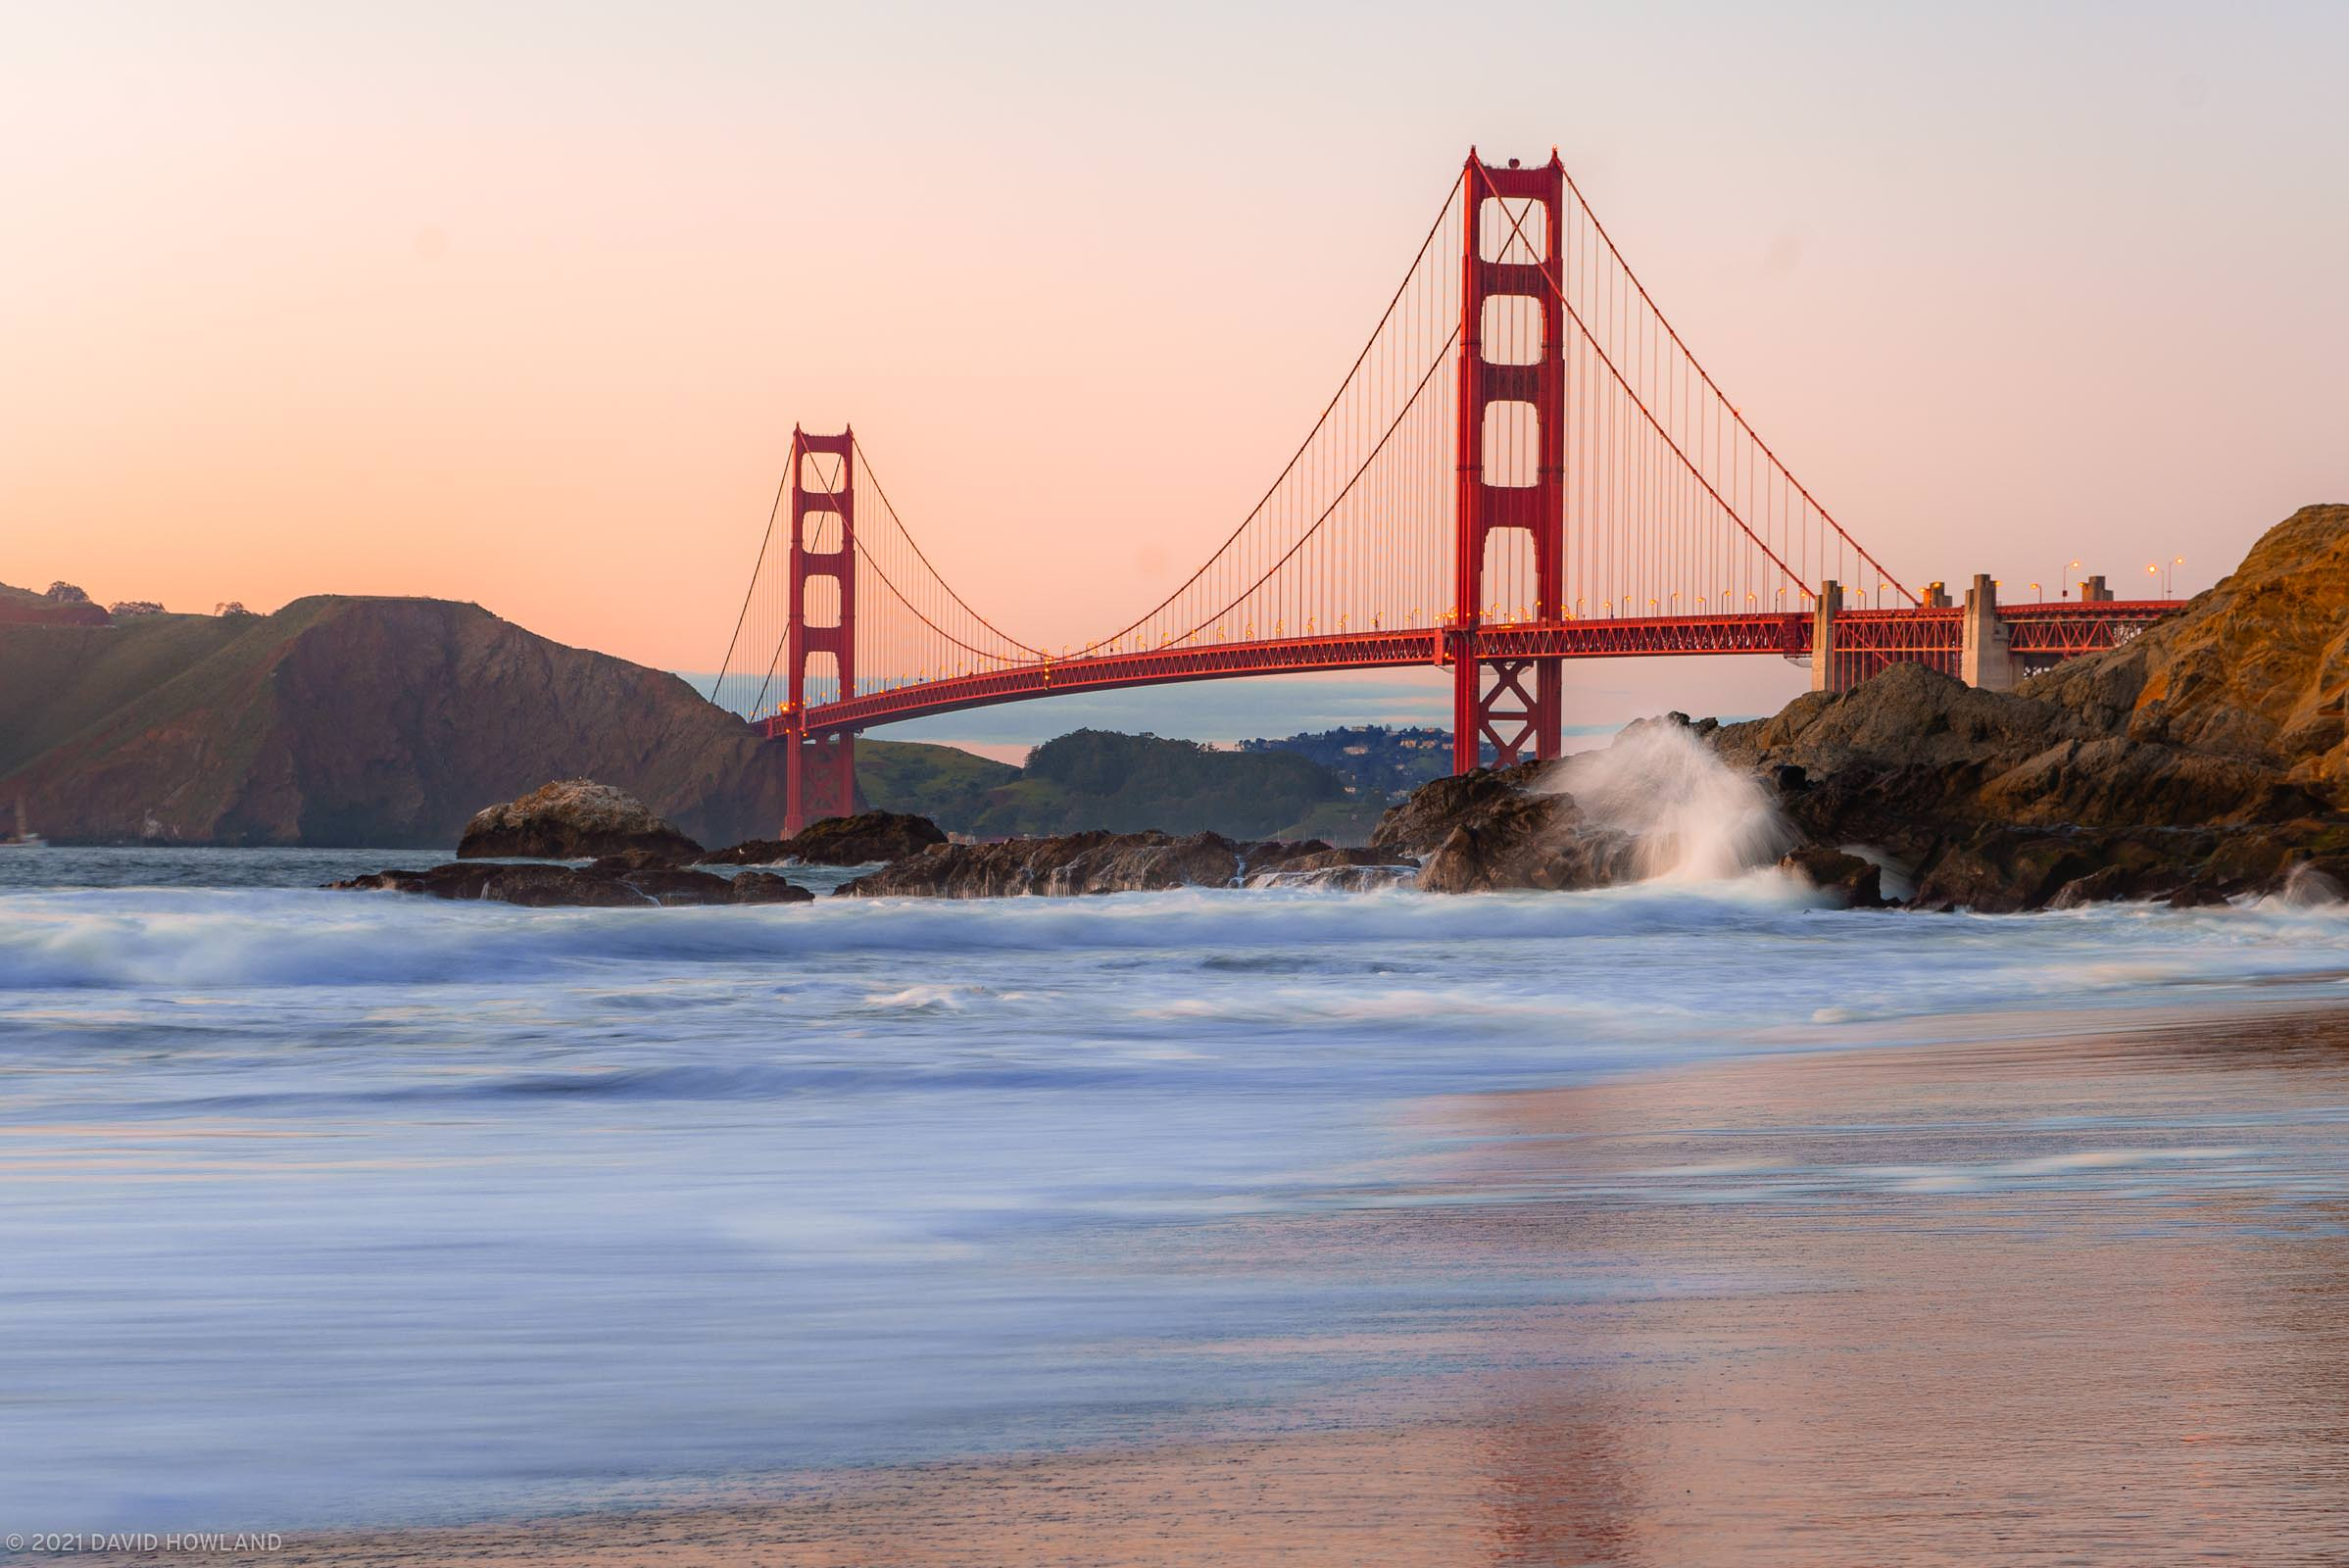 Golden Gate Bridge Sunset from Baker Beach